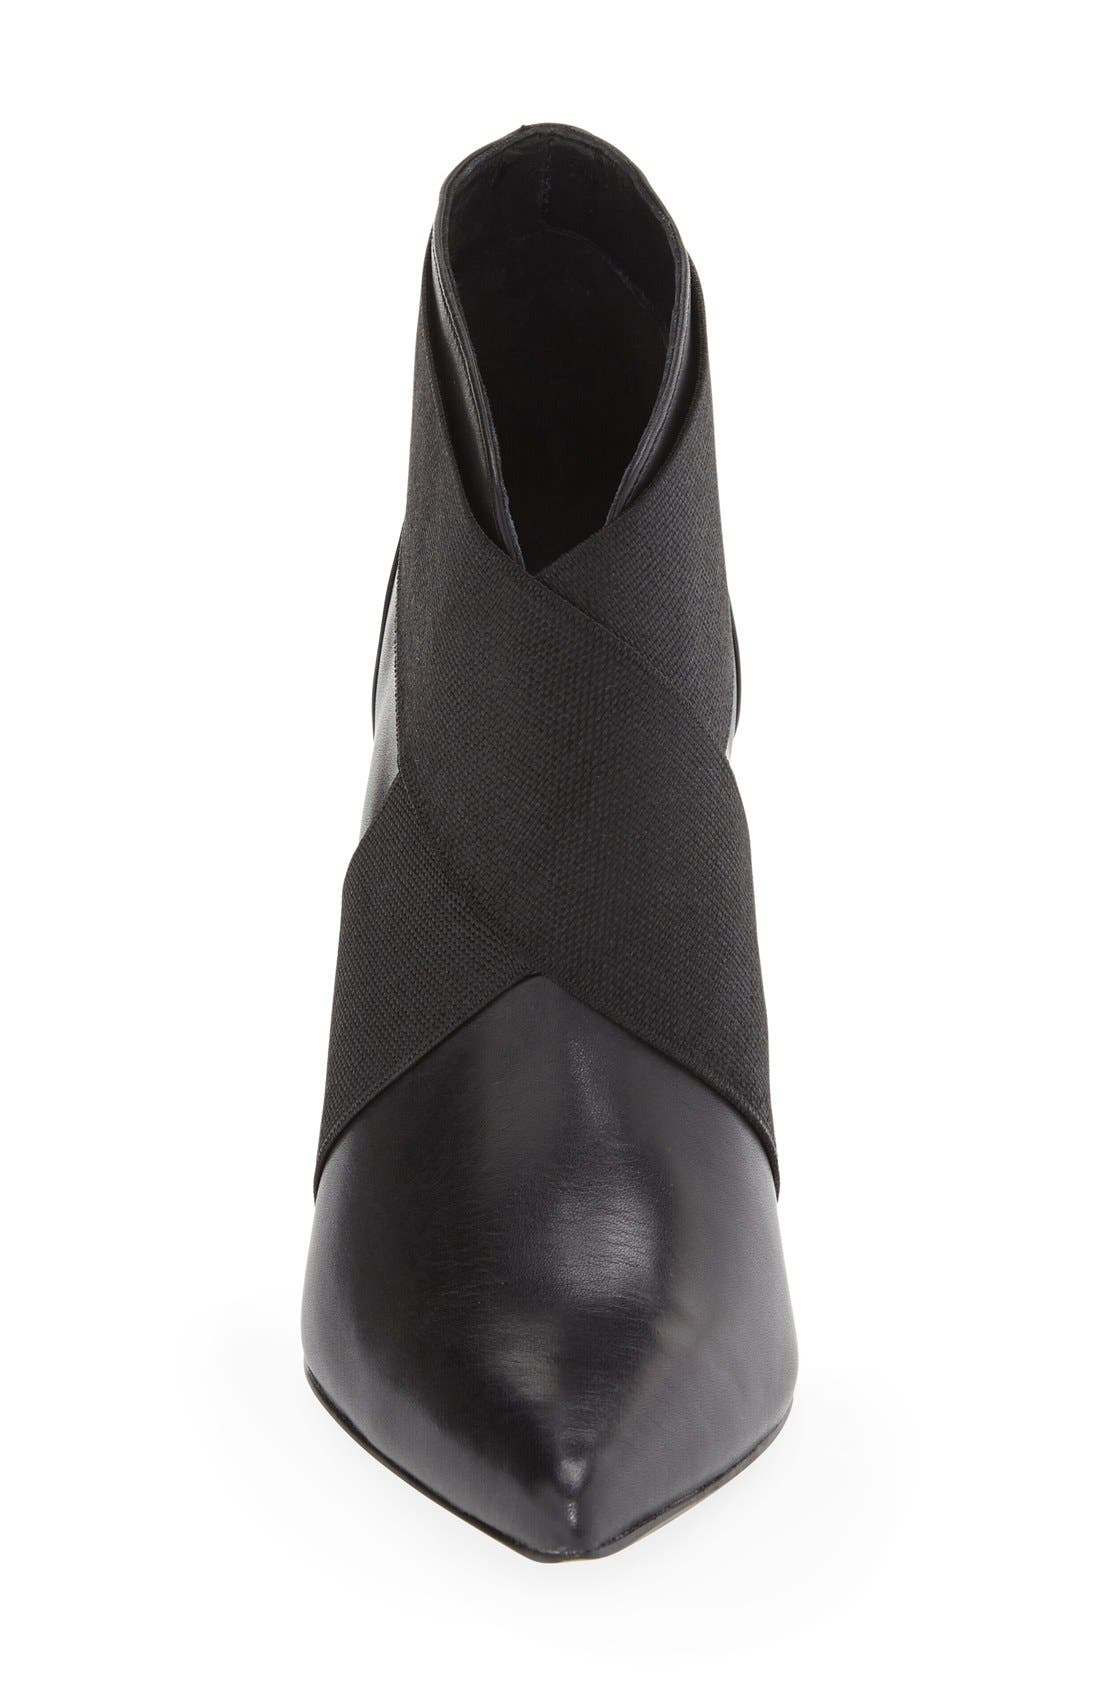 Alternate Image 3  - Ted Baker London 'Lenaus' Pointy Toe Bootie (Women)